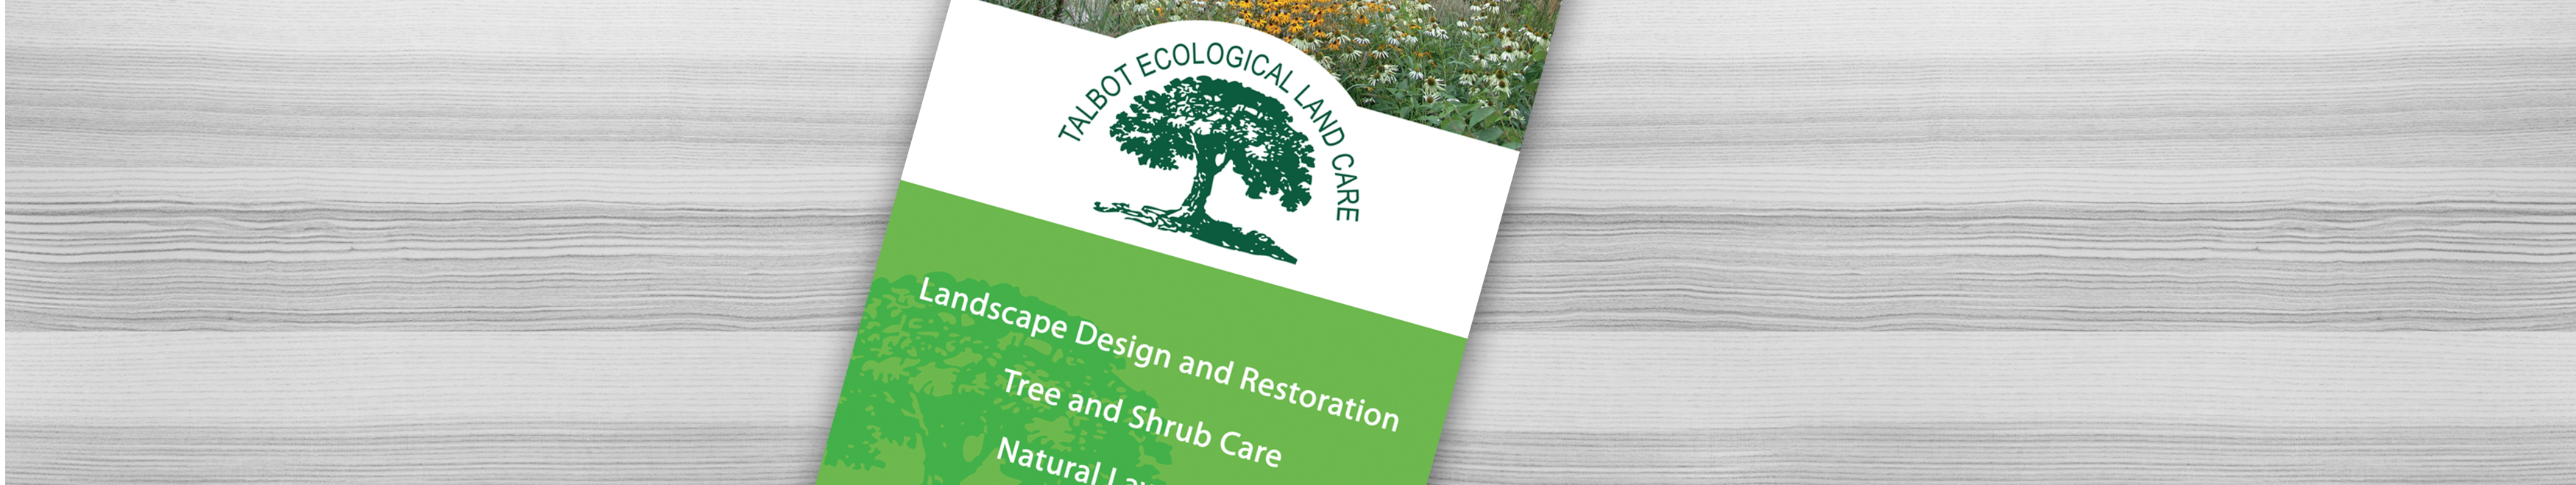 Retractable banner design in Massachusetts and Cape Cod